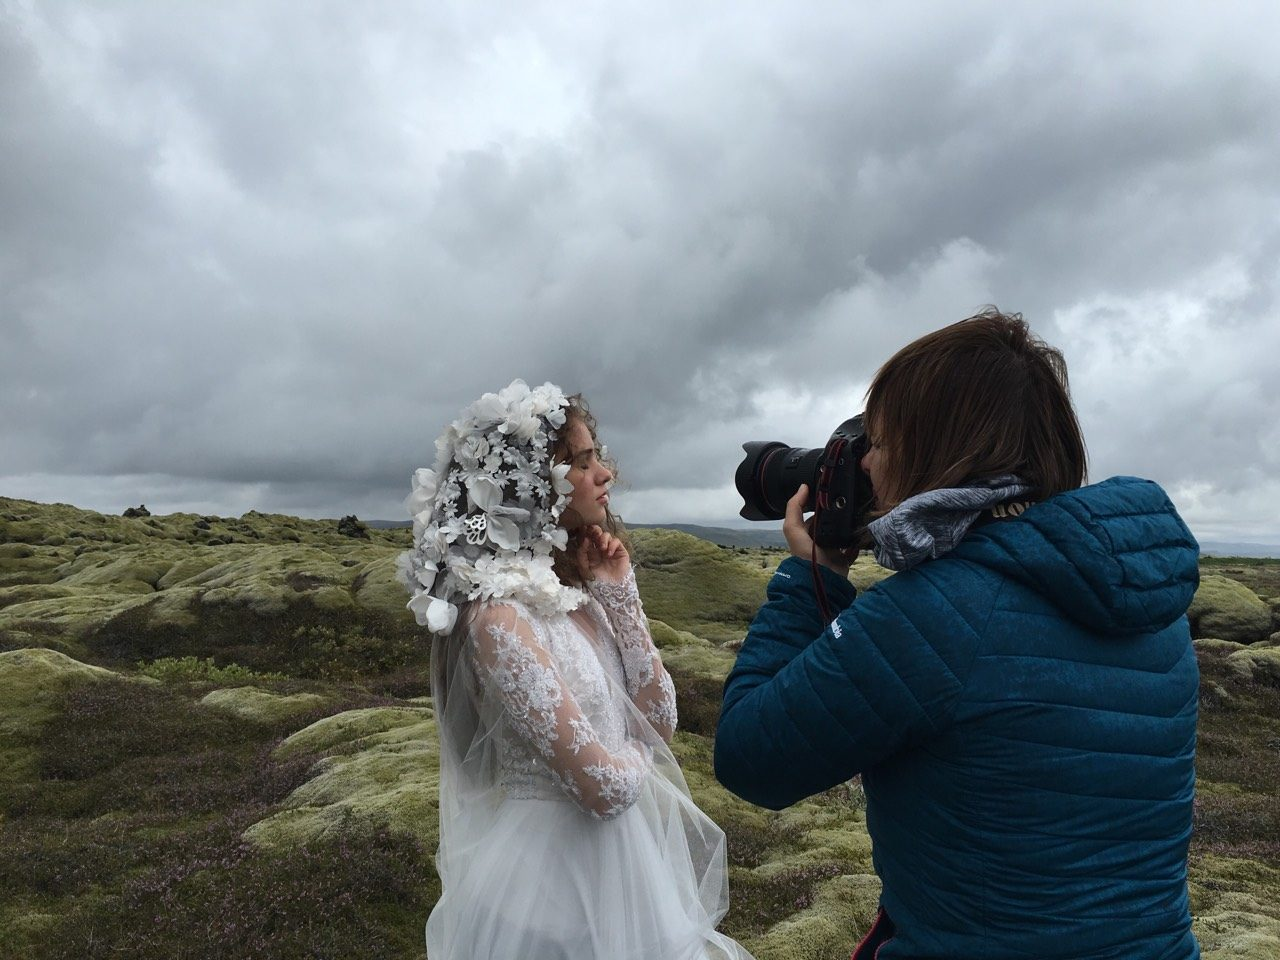 izland szigetén